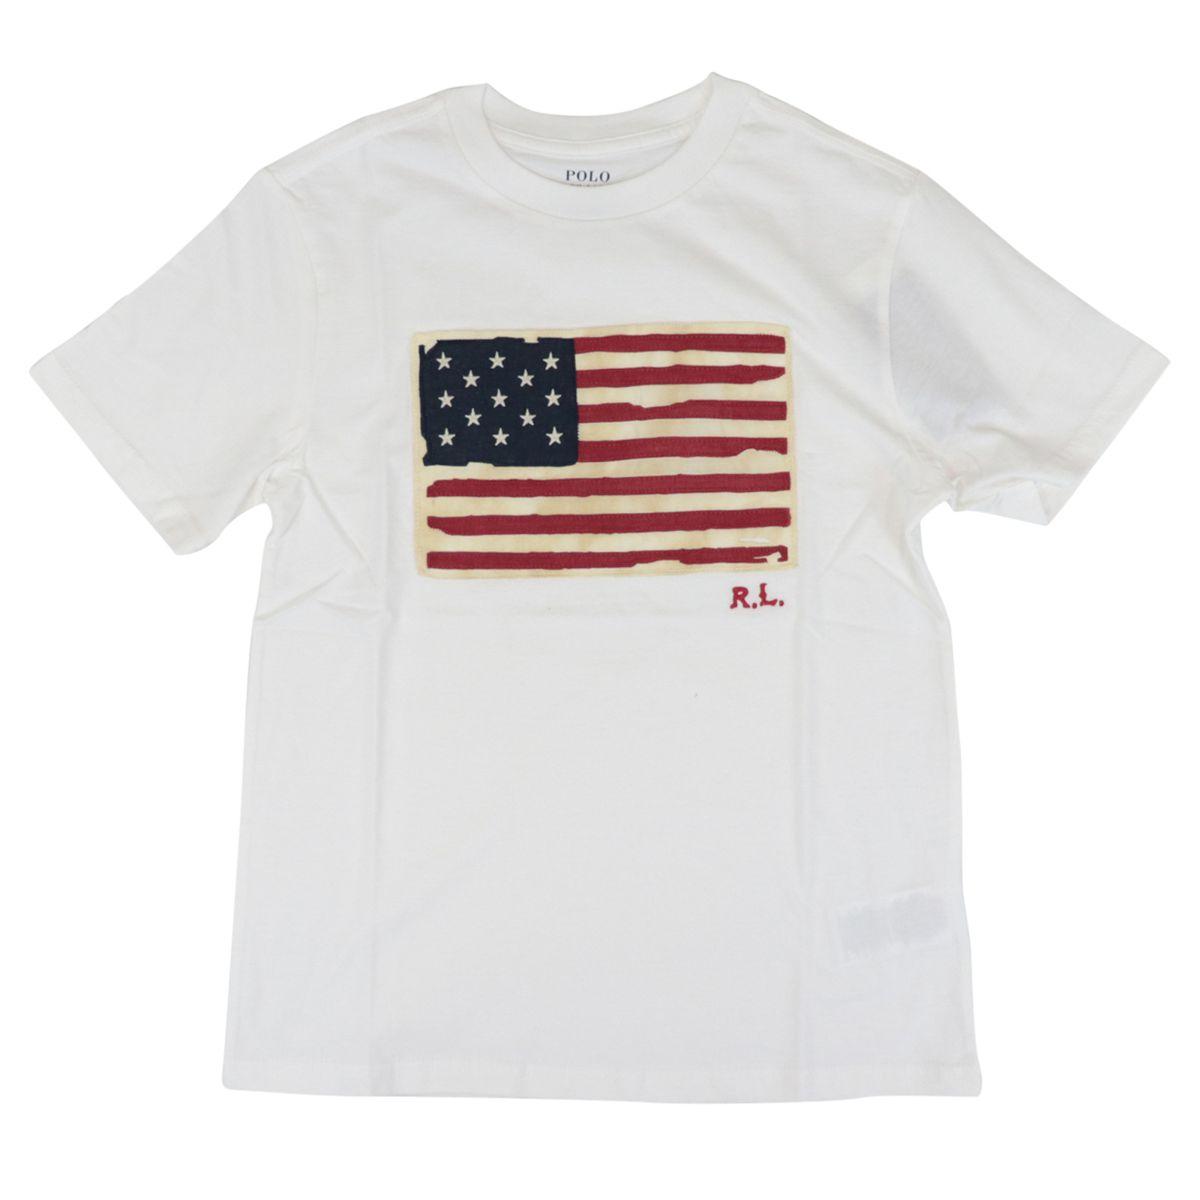 Cotton t-shirt with front logo flag print White Polo Ralph Lauren